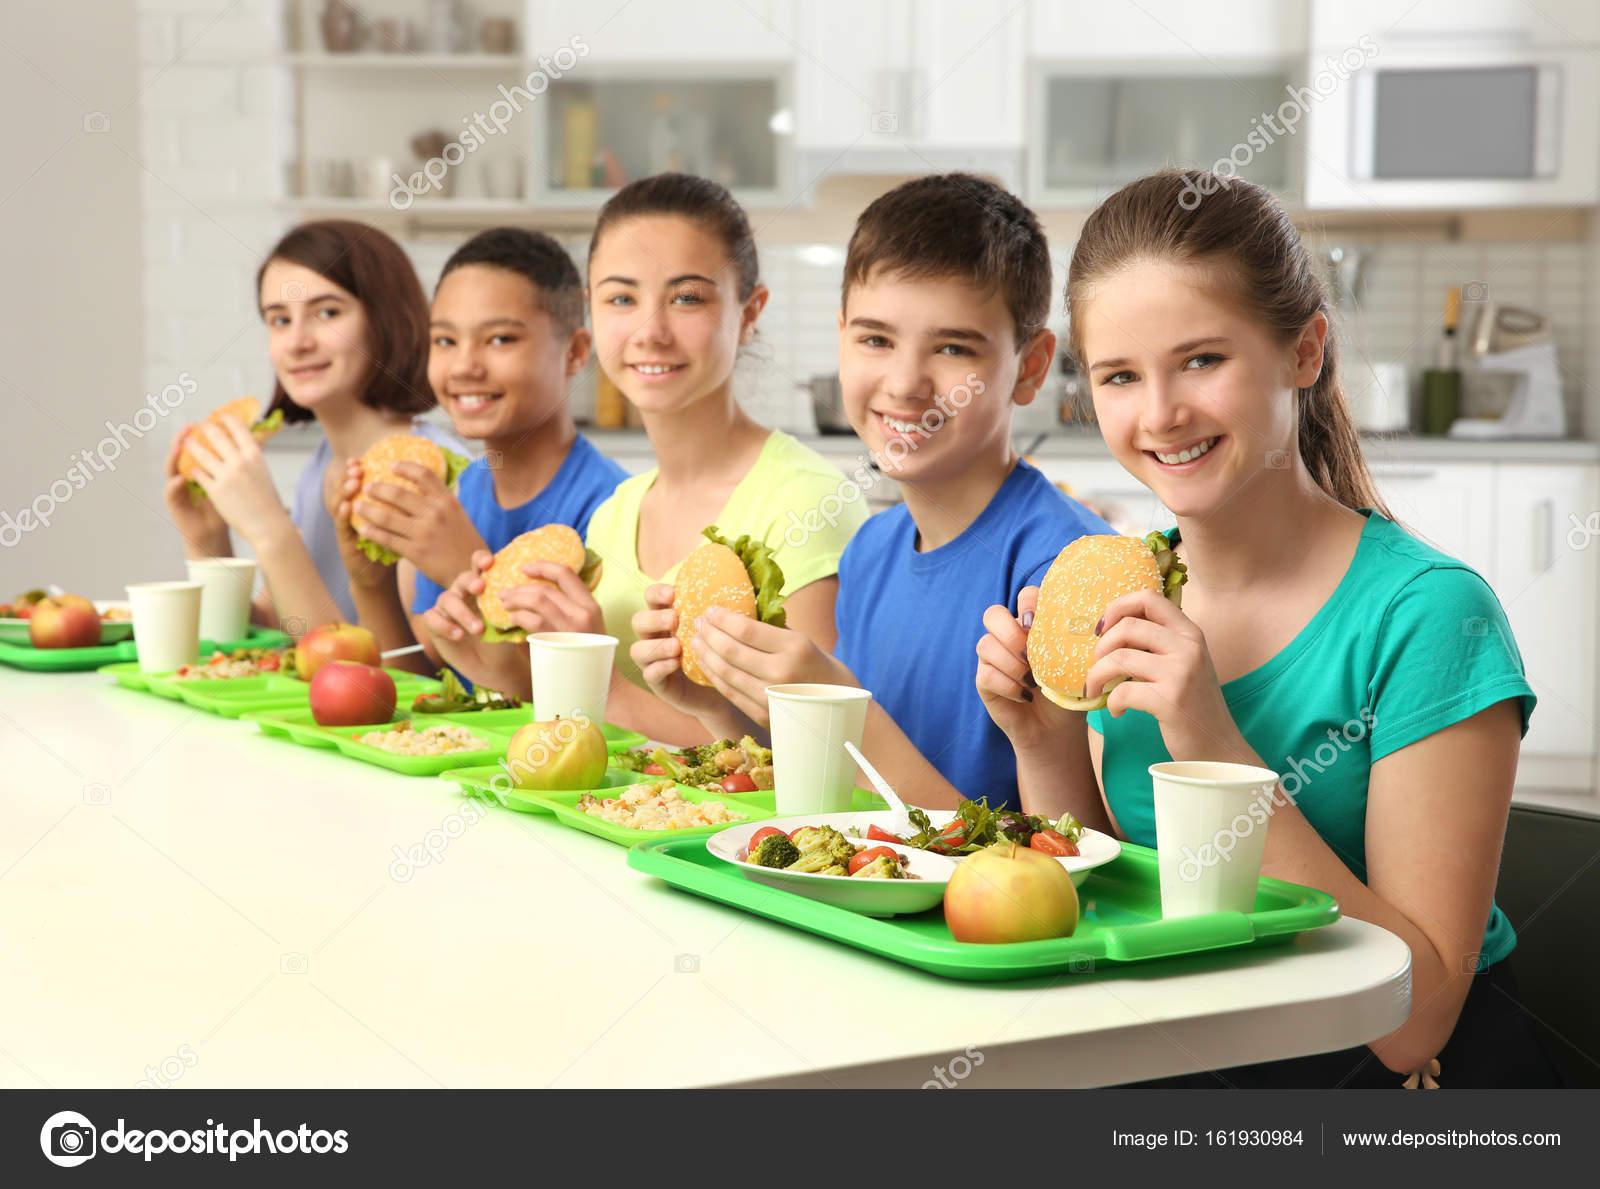 Comendo na escola and hot